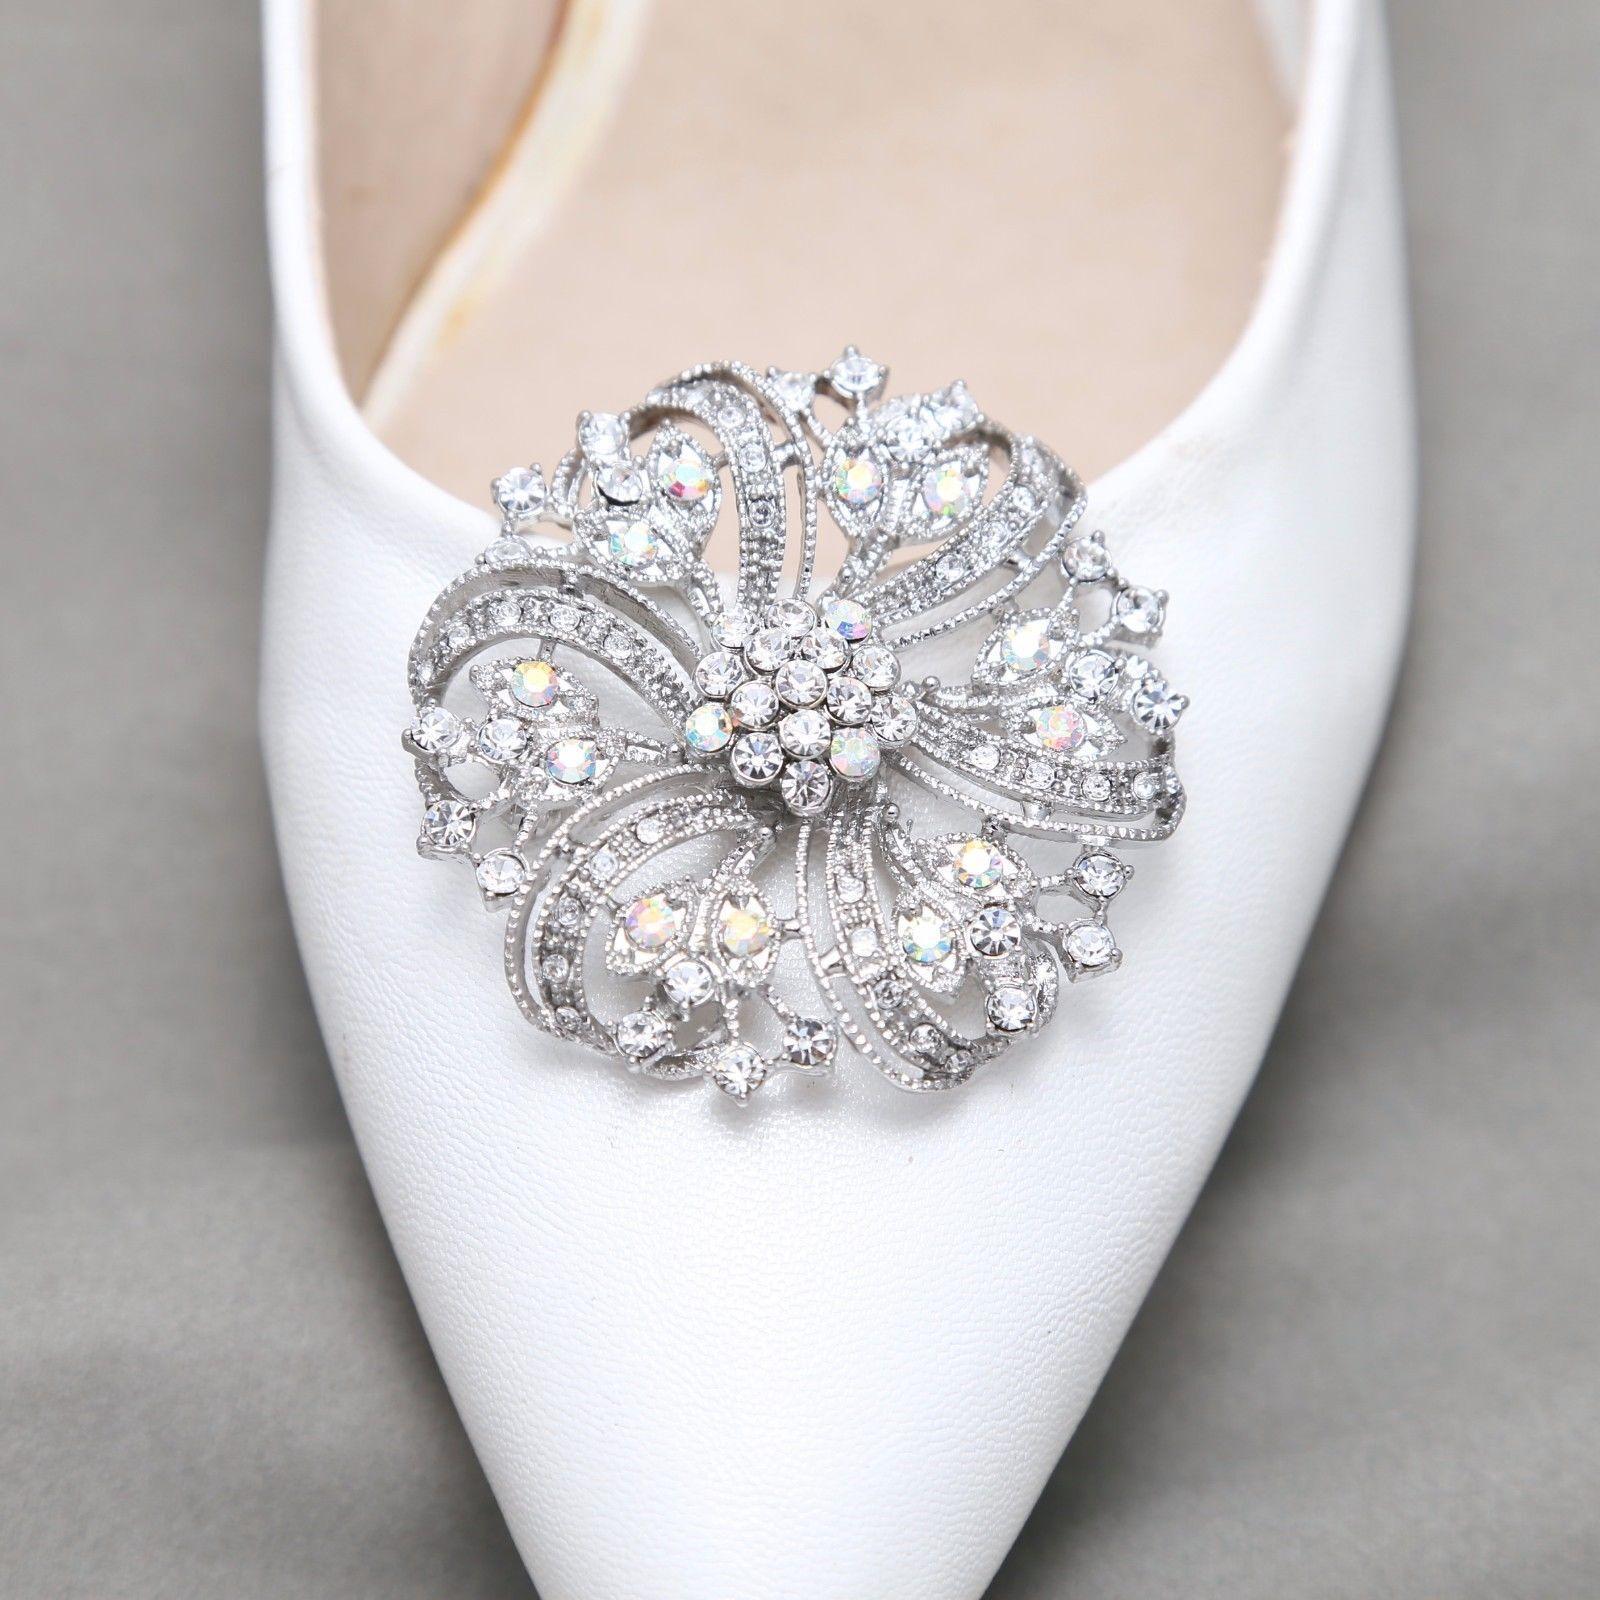 2 Pcs Round Aurora Rainbow Crystal Wedding Shoe Clips Bridal Shoes Decoration